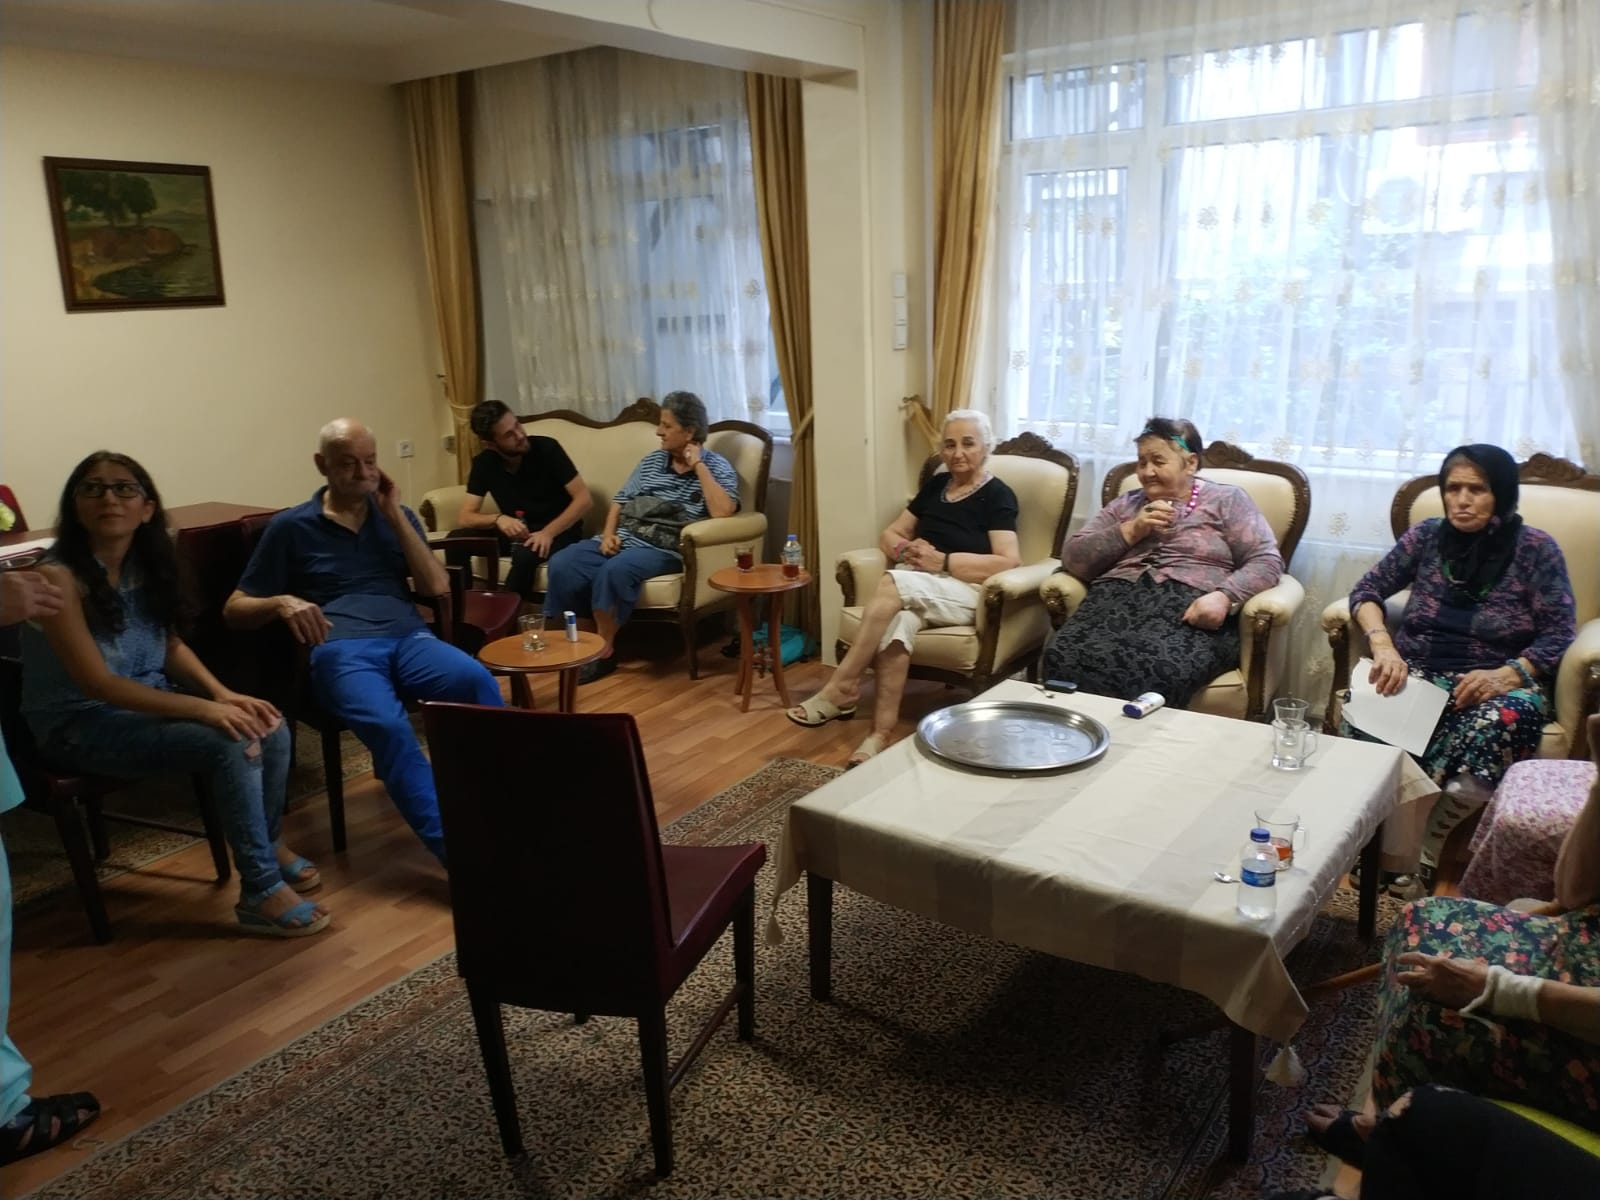 26.07.2018 / Bakırköy Şefkat Huzurevi Ziyareti